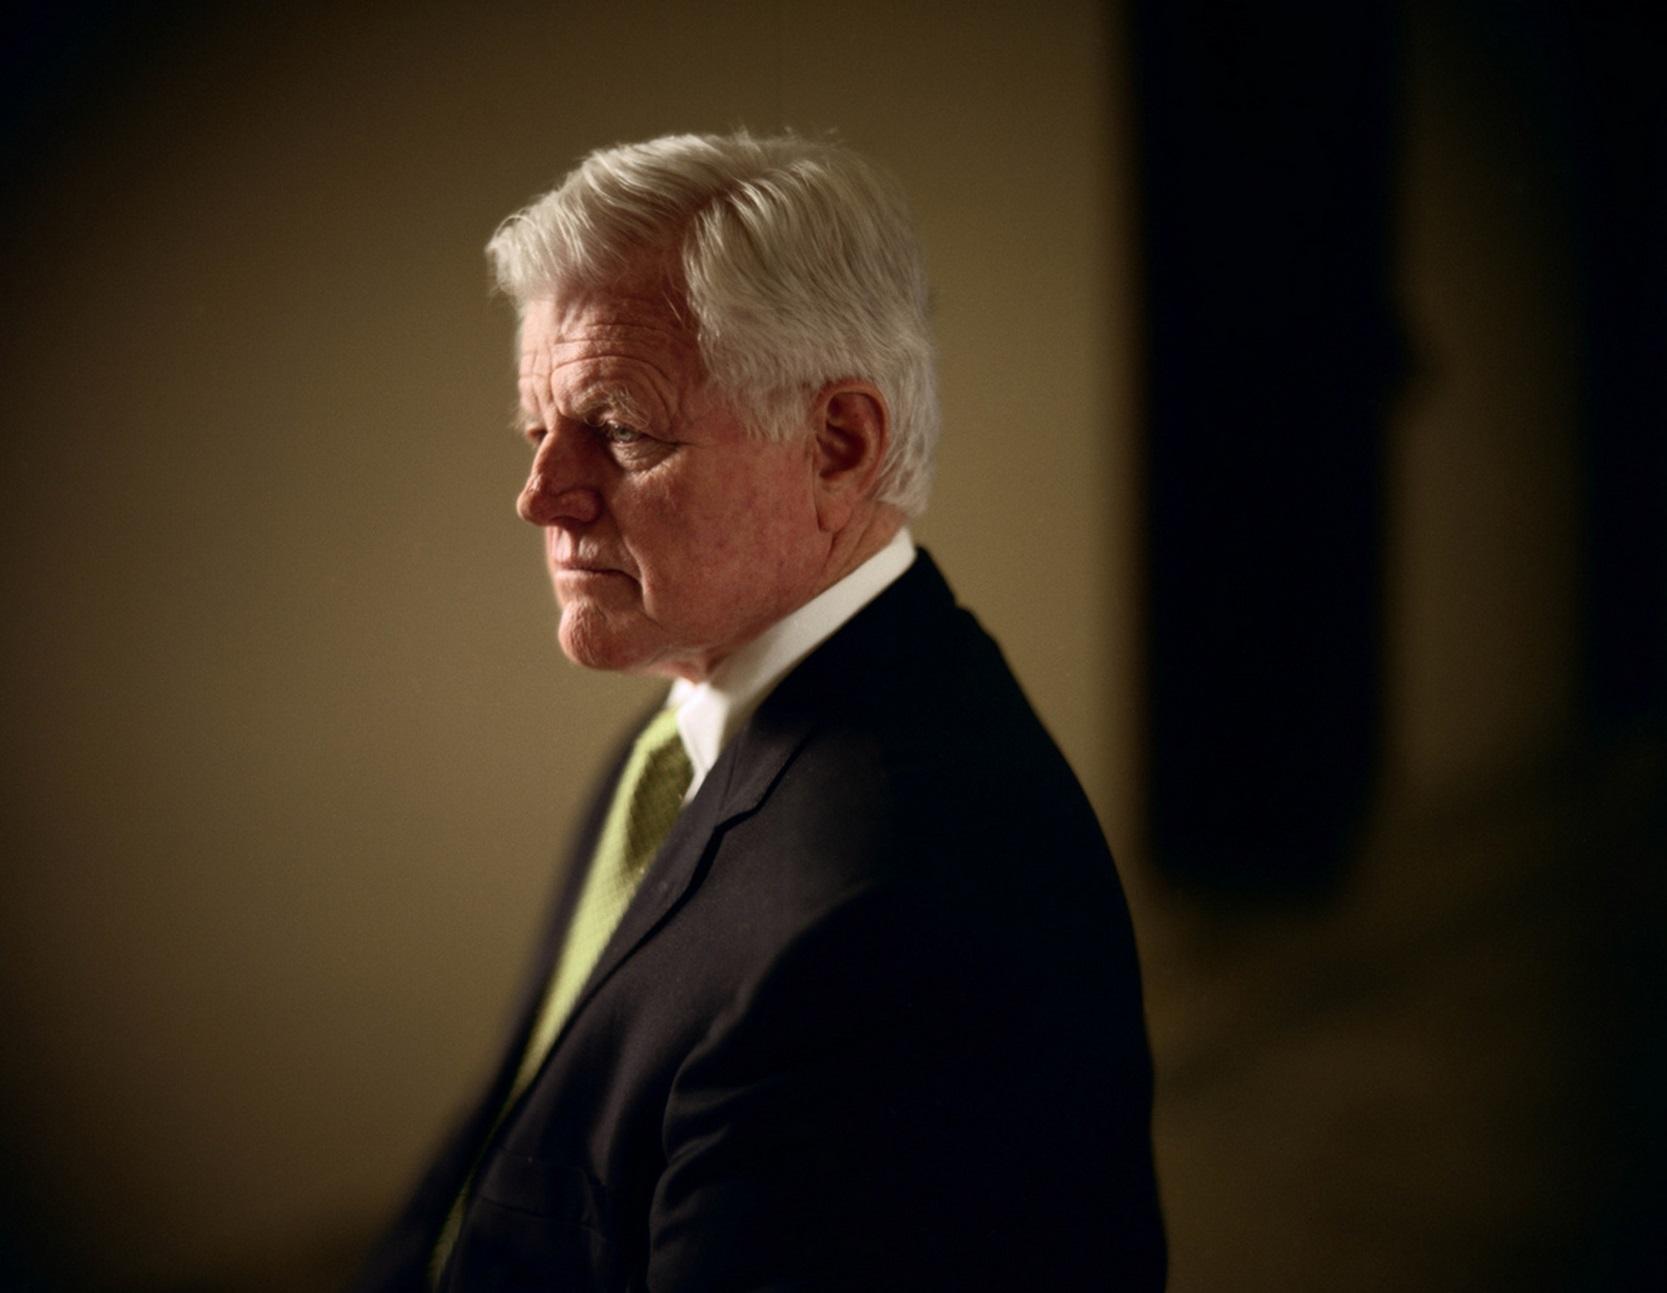 Senator Ted Kennedy in Washington DC, 2006. © 2015 David Burnett/Contact Press Images